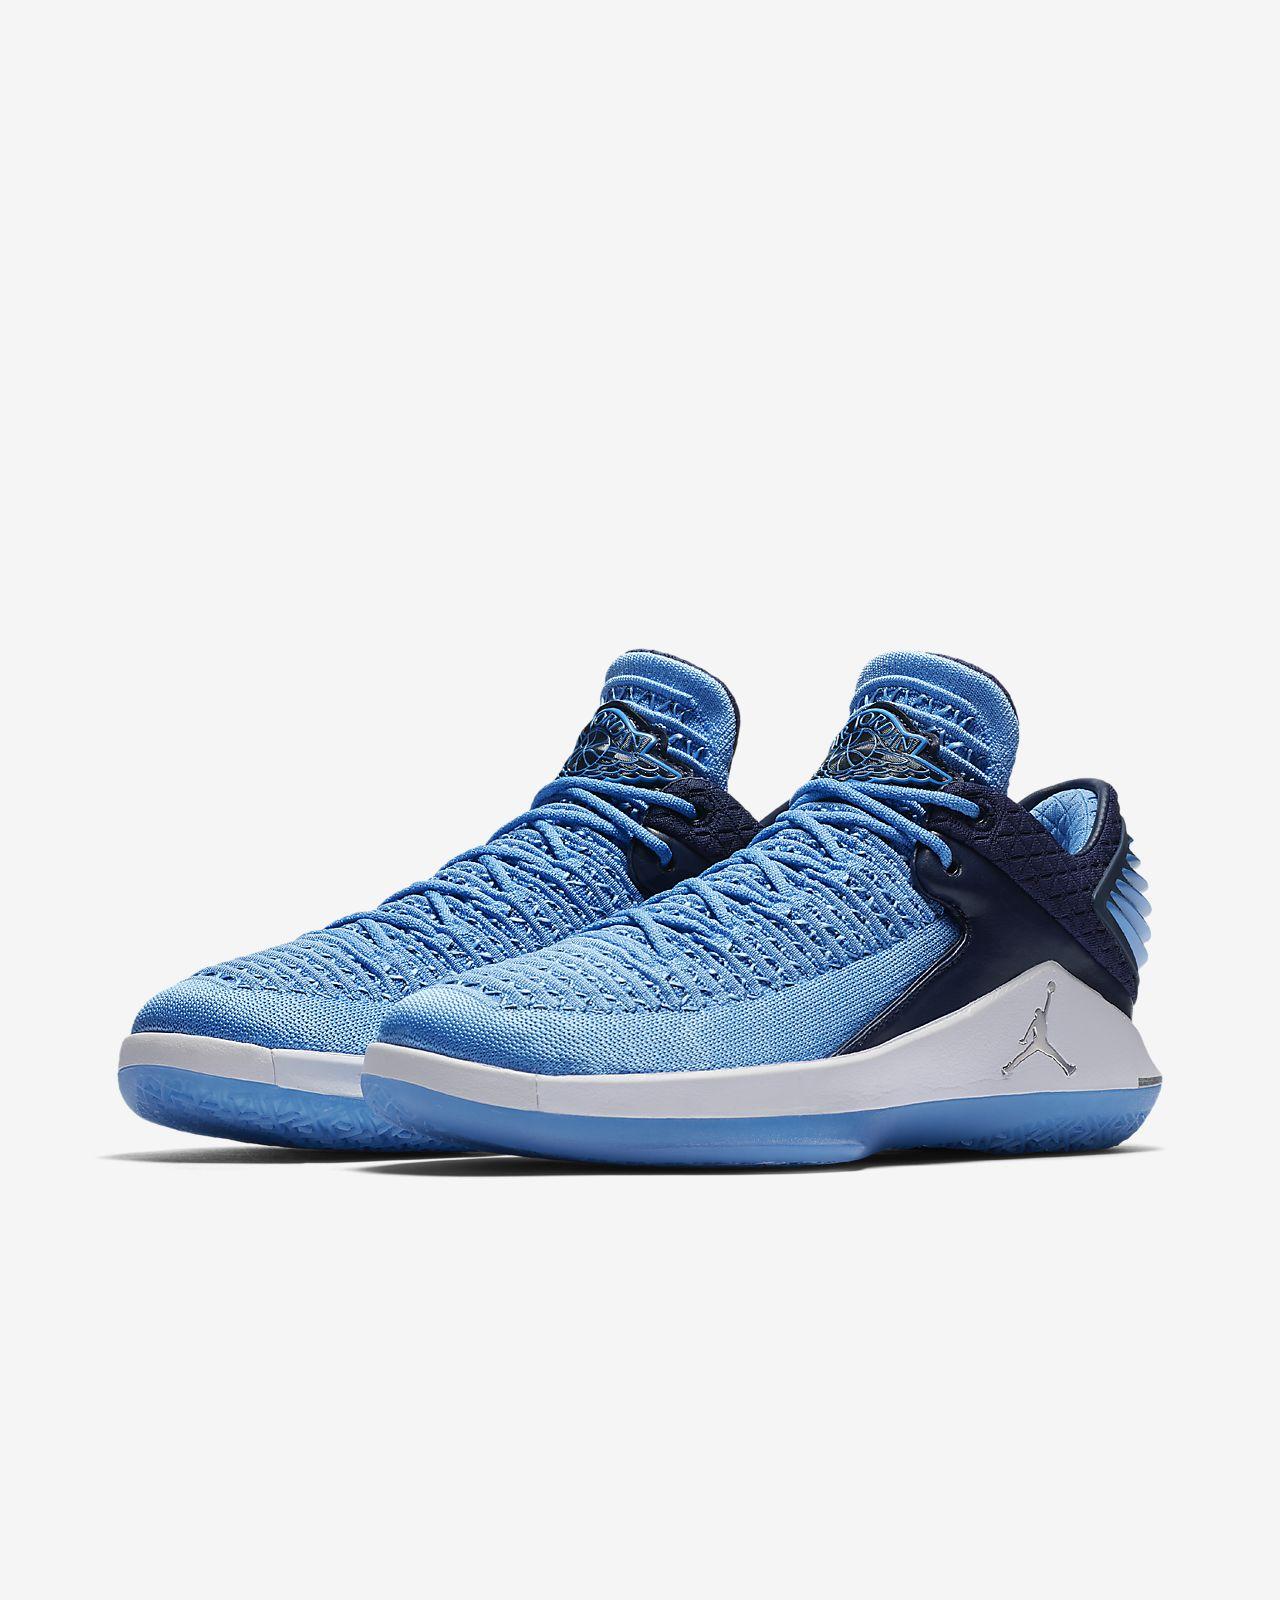 ... Air Jordan XXXII Low Men\u0027s Basketball Shoe